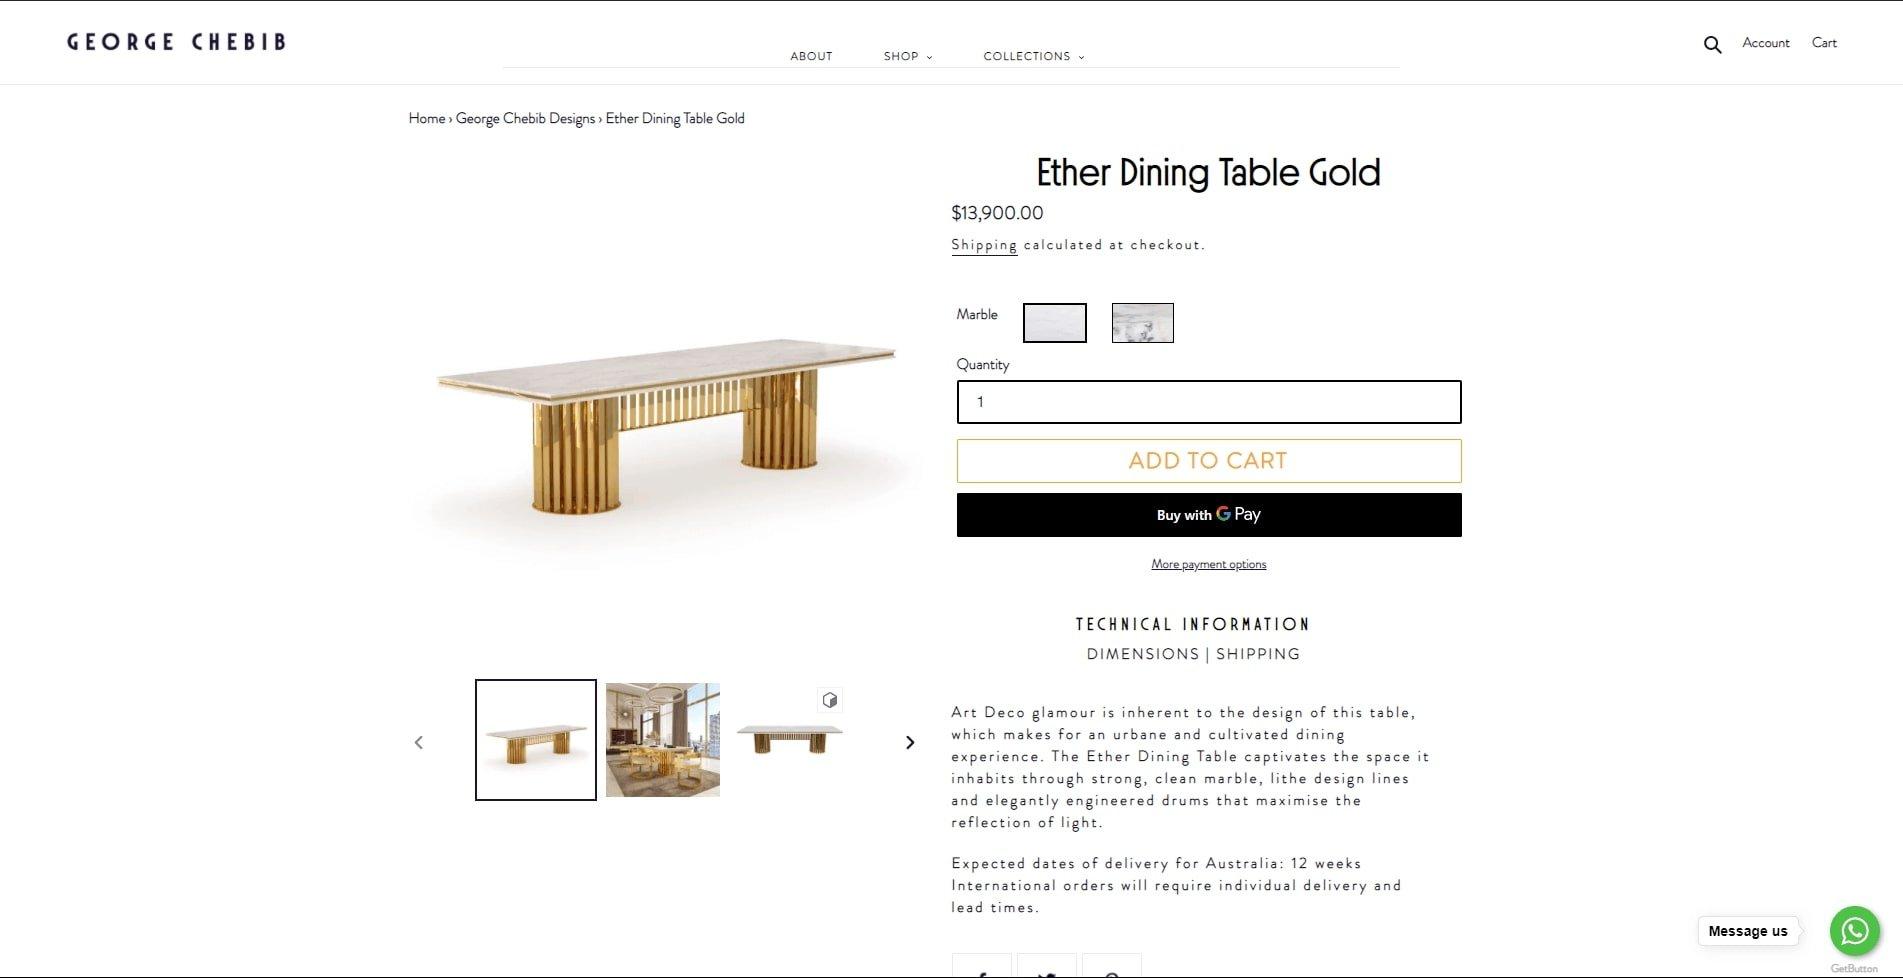 Screenshot Capturing Table Renders Taken on George Chebib Furniture Site